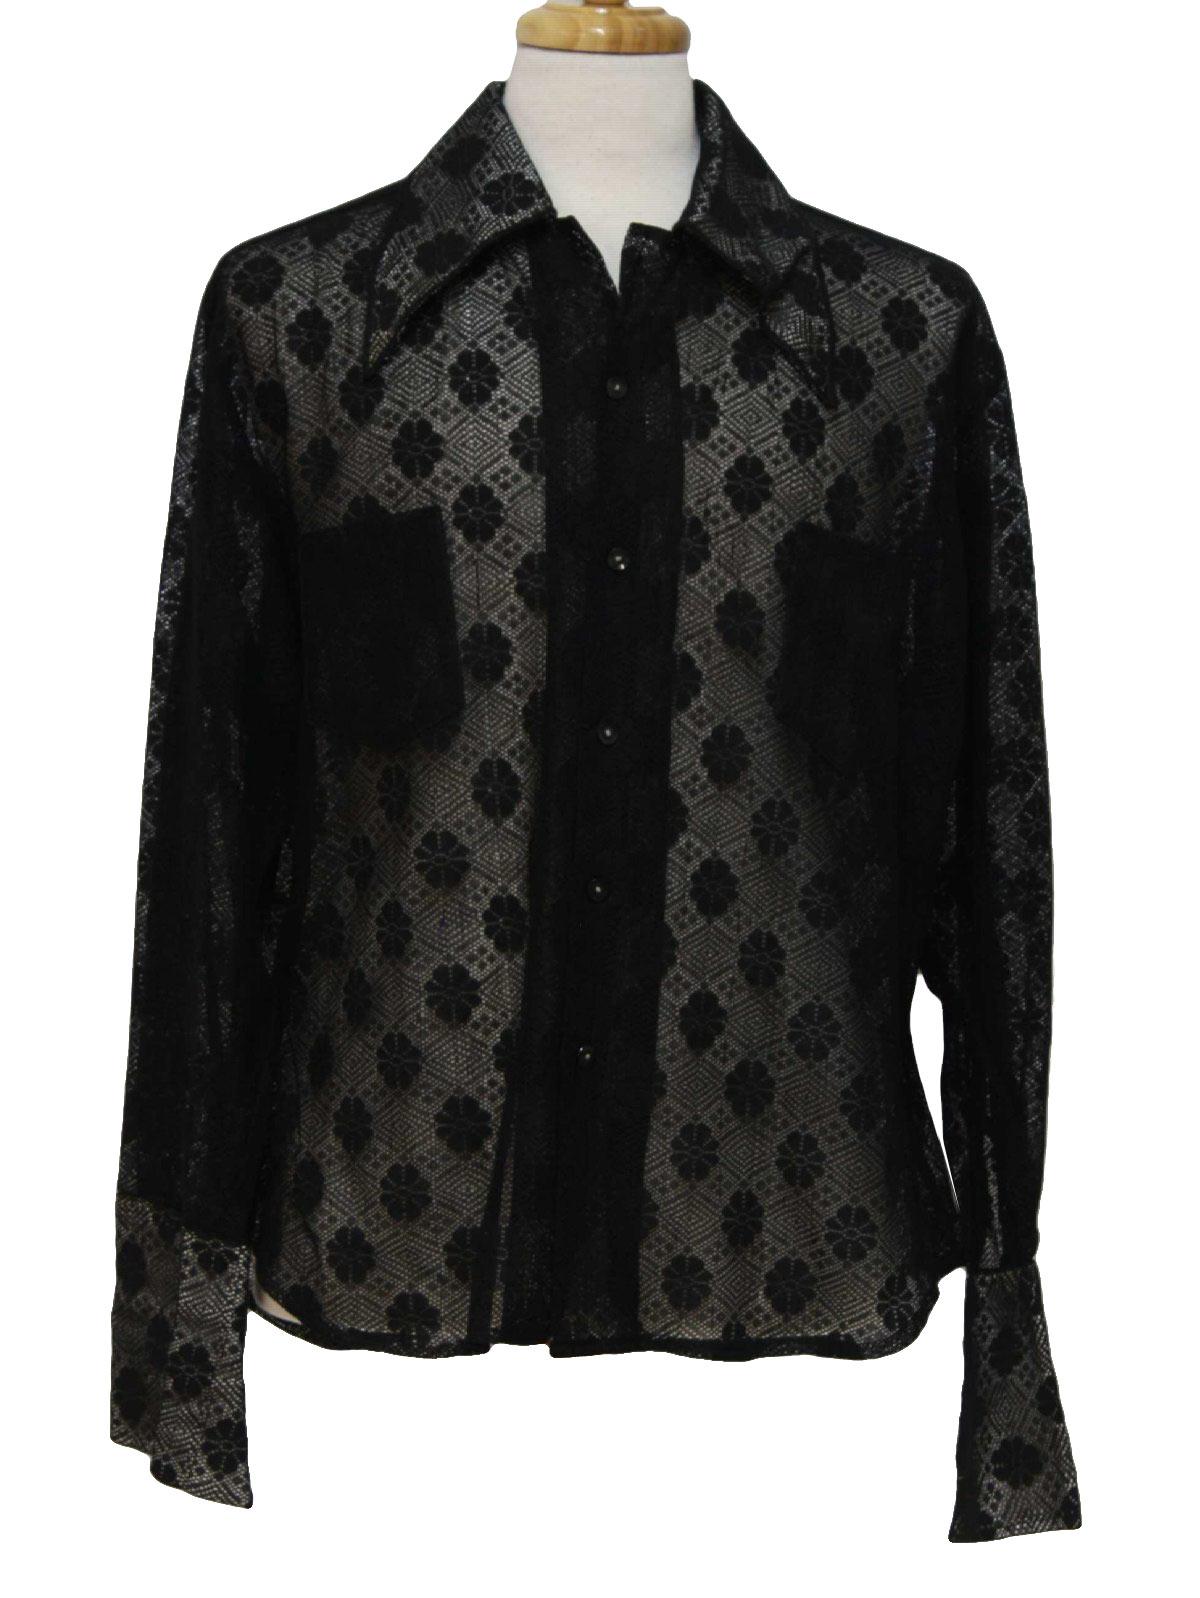 Retro Seventies Disco Shirt 70s Missing Label Mens